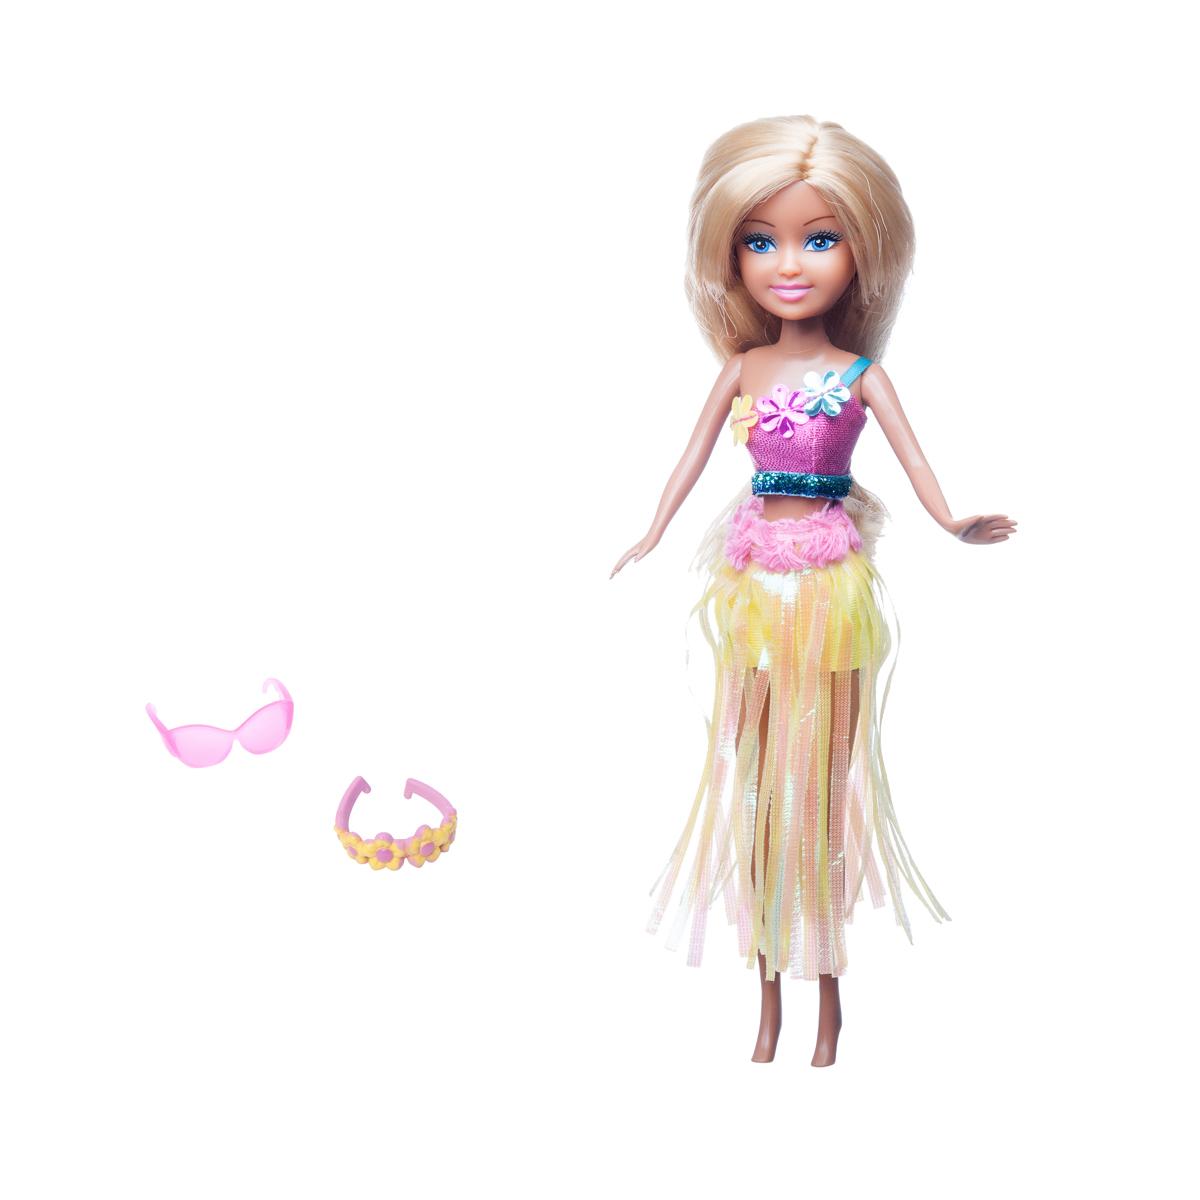 Sparkle Girlz Hawaiidocka med accessoarer Gul klänning